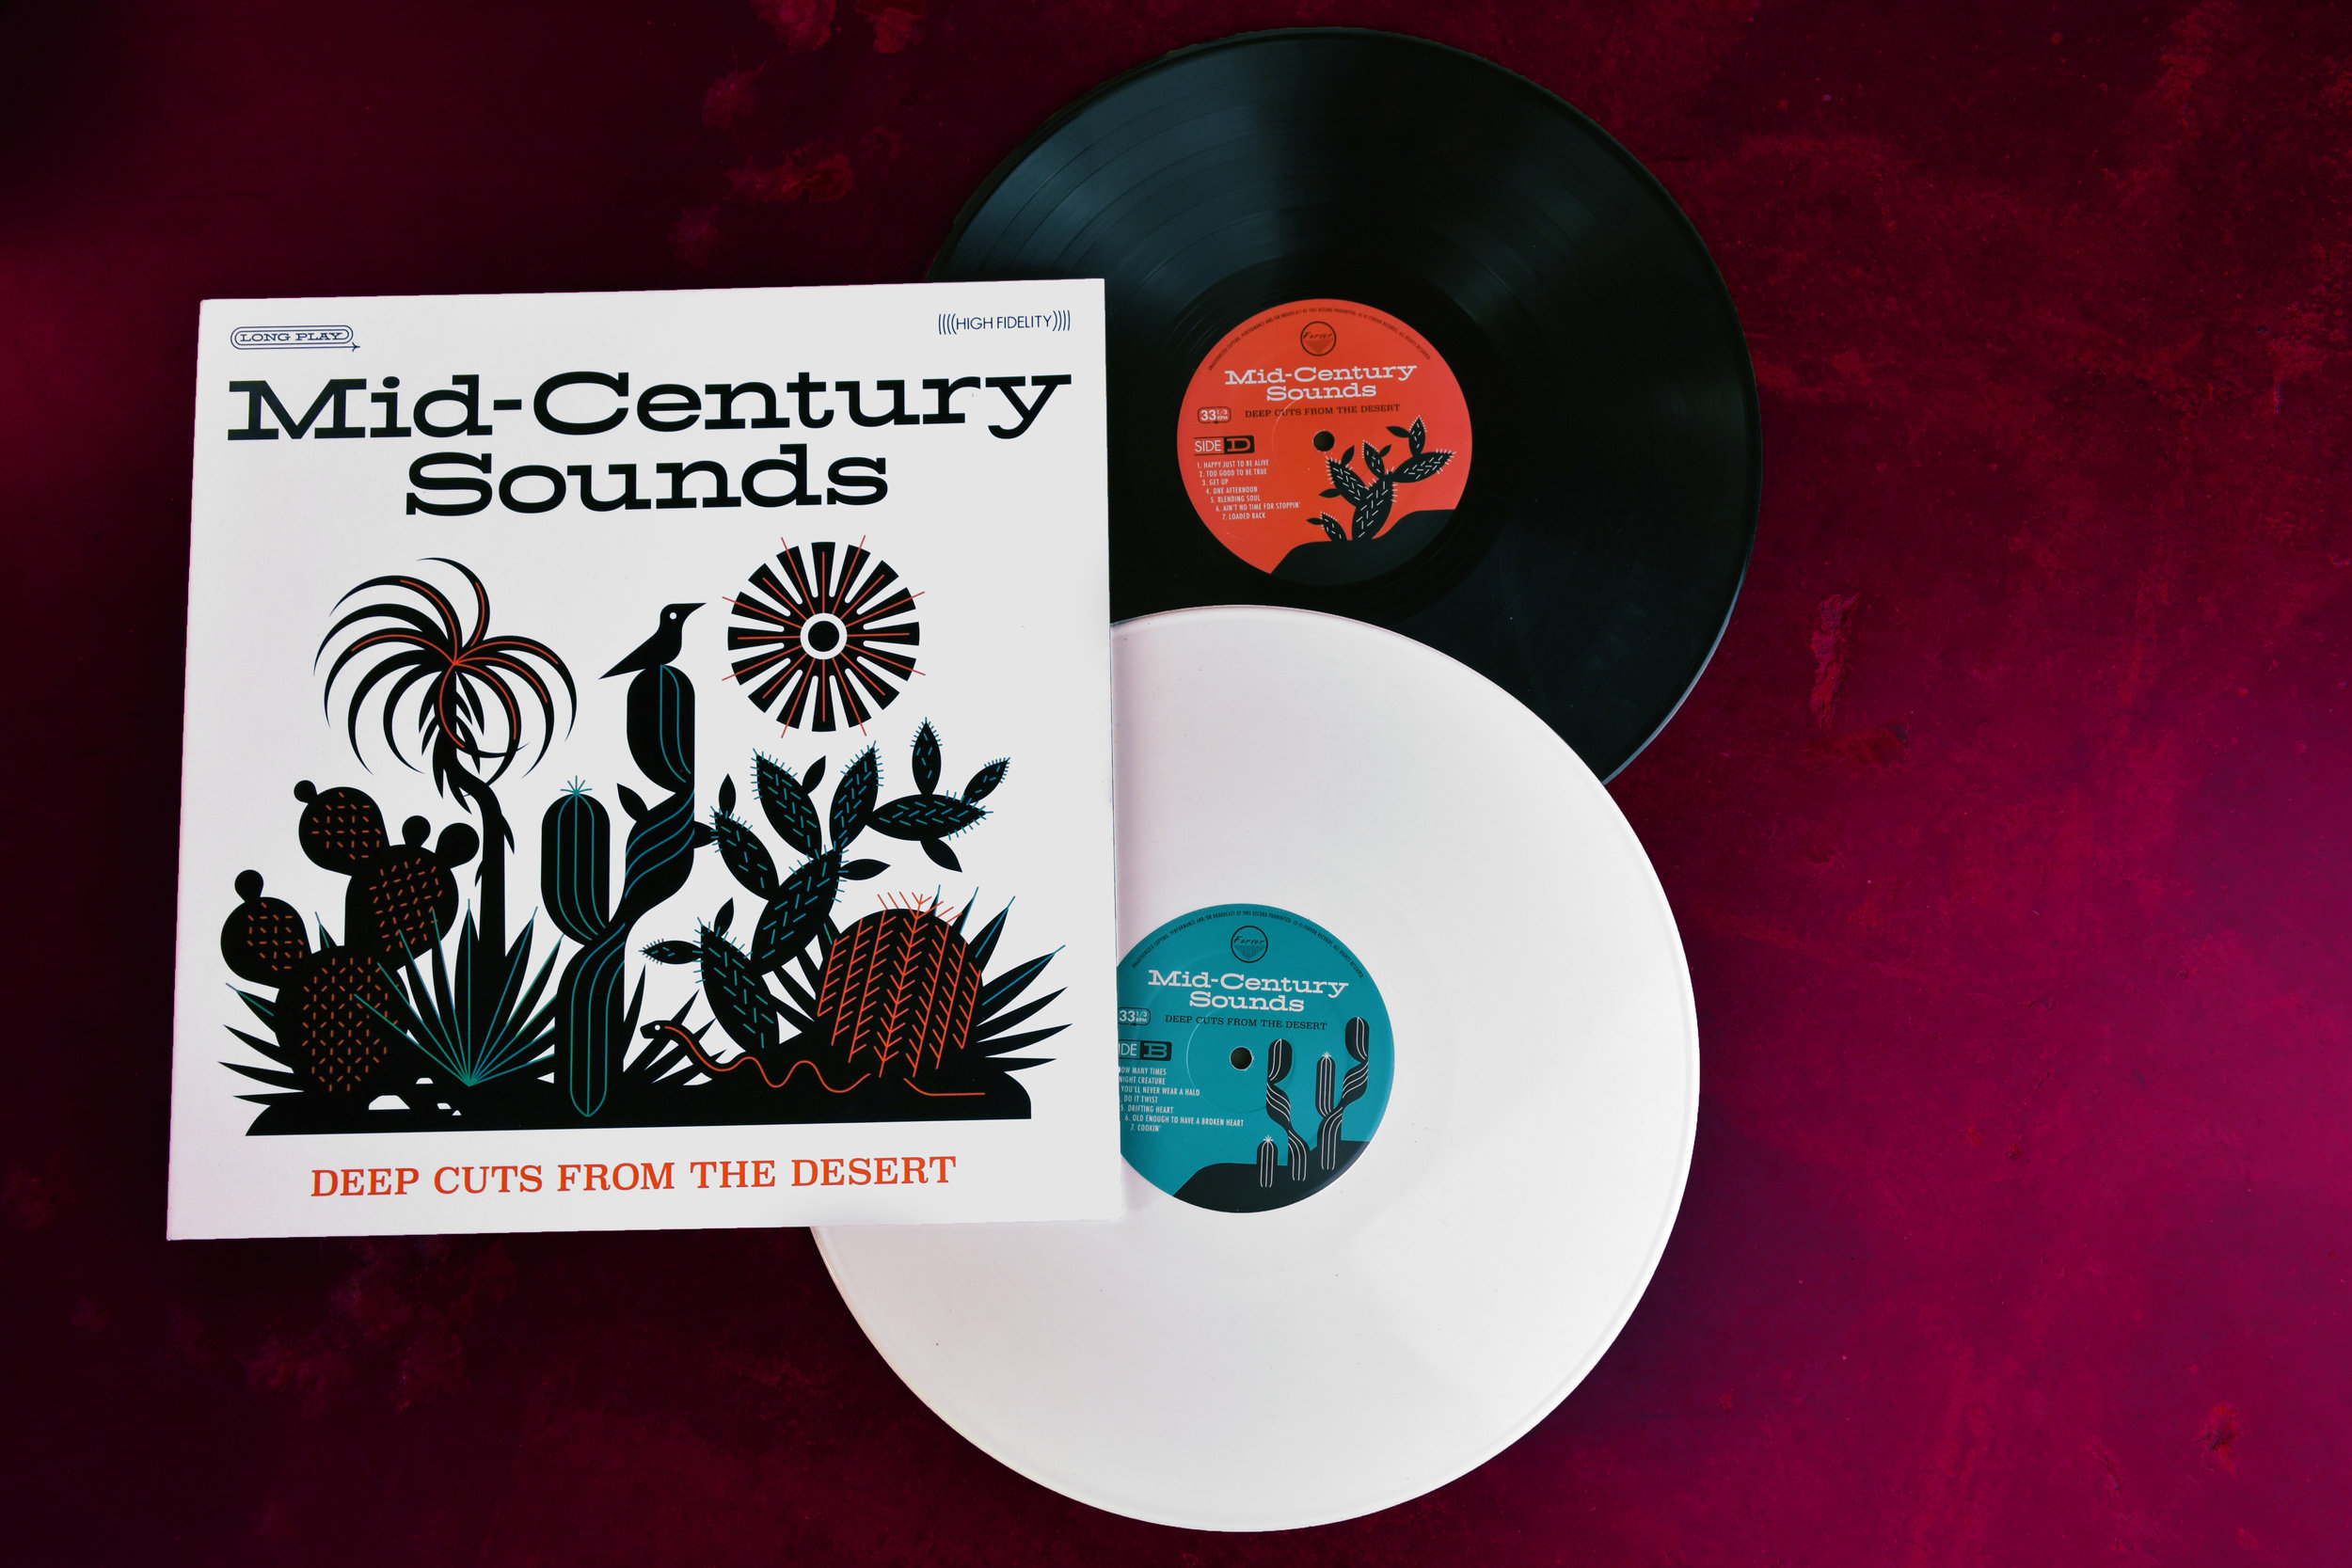 Mid Century Sounds Vinyl Promo 2.jpg